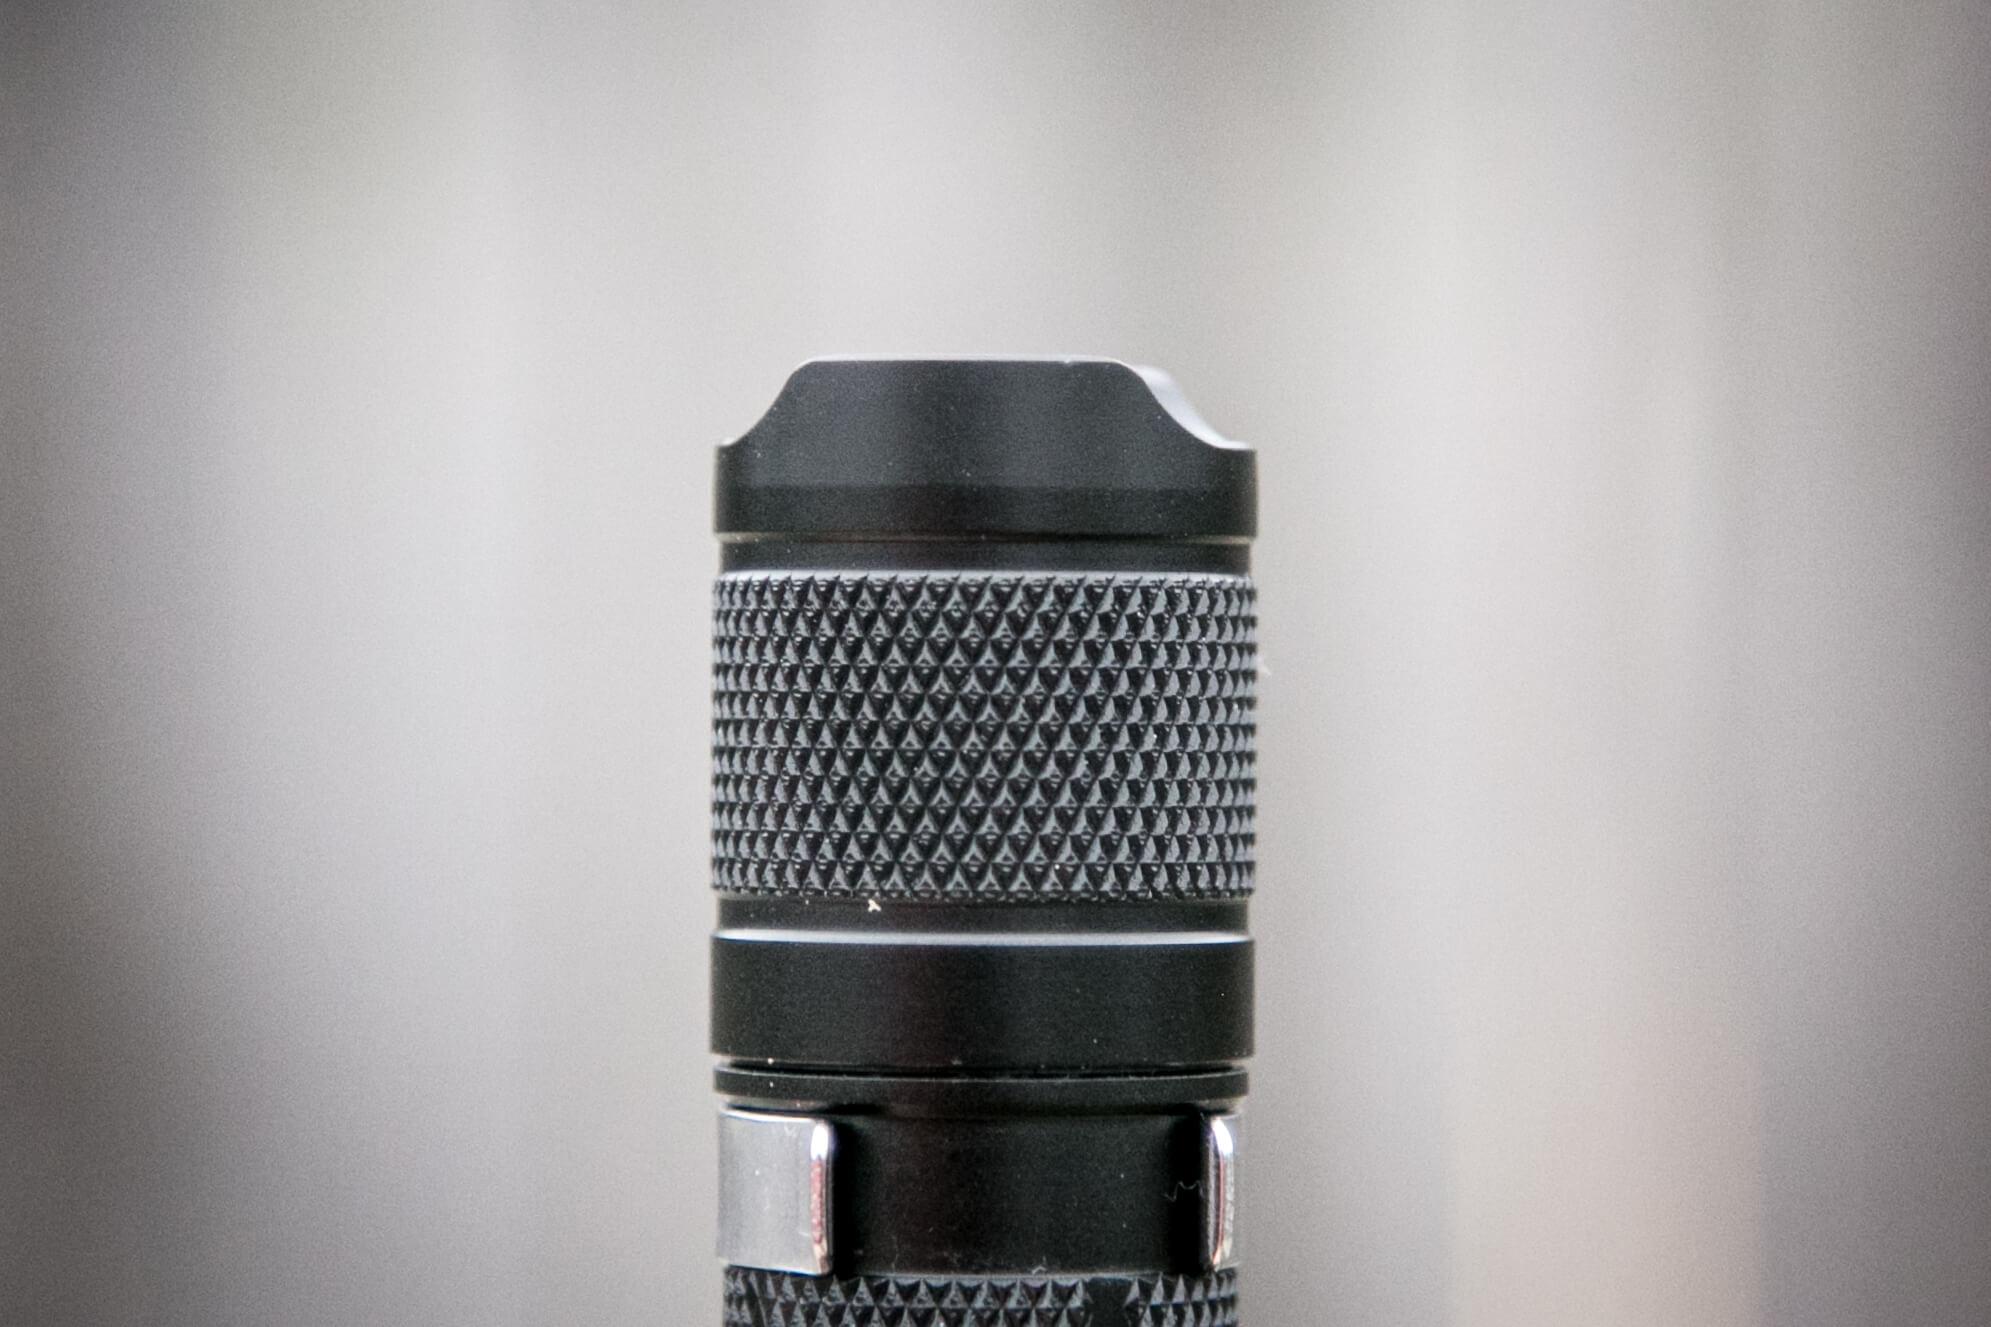 sofirn sp31uv ultraviolet 18650 flashlight tailcap